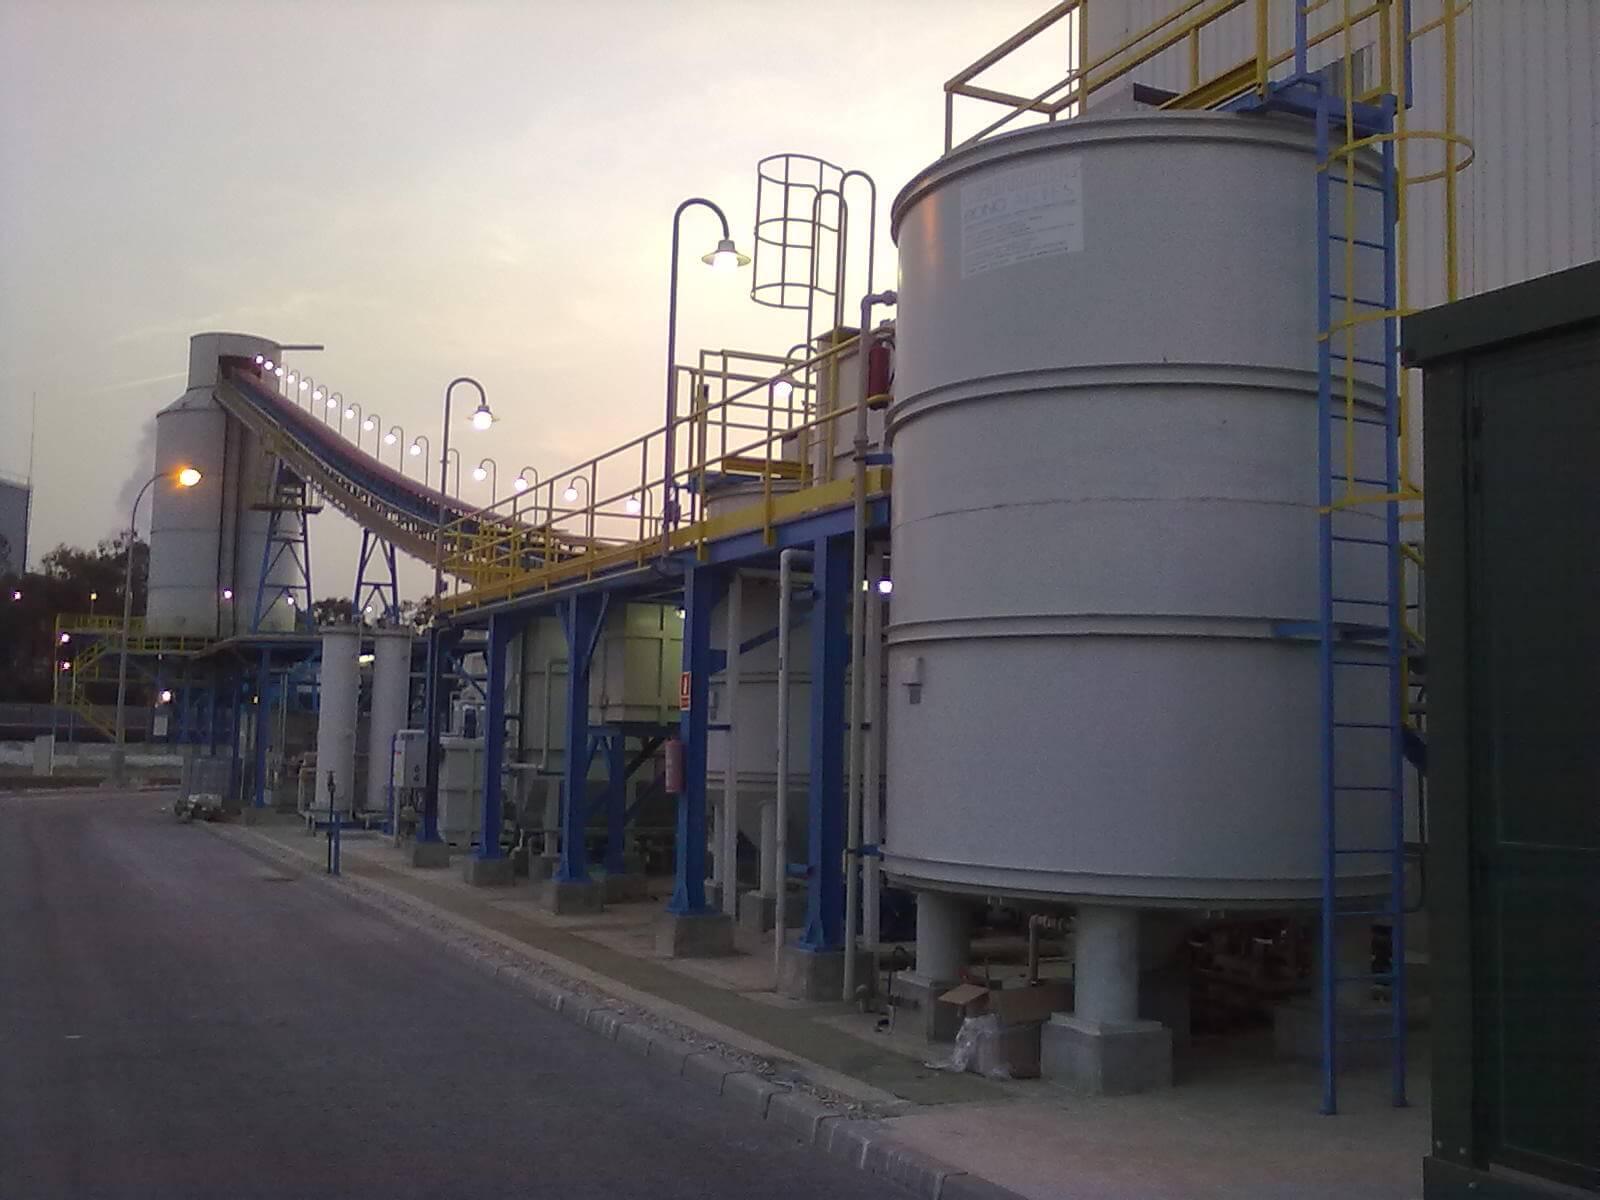 Artes-Ingegneria-Wastewater